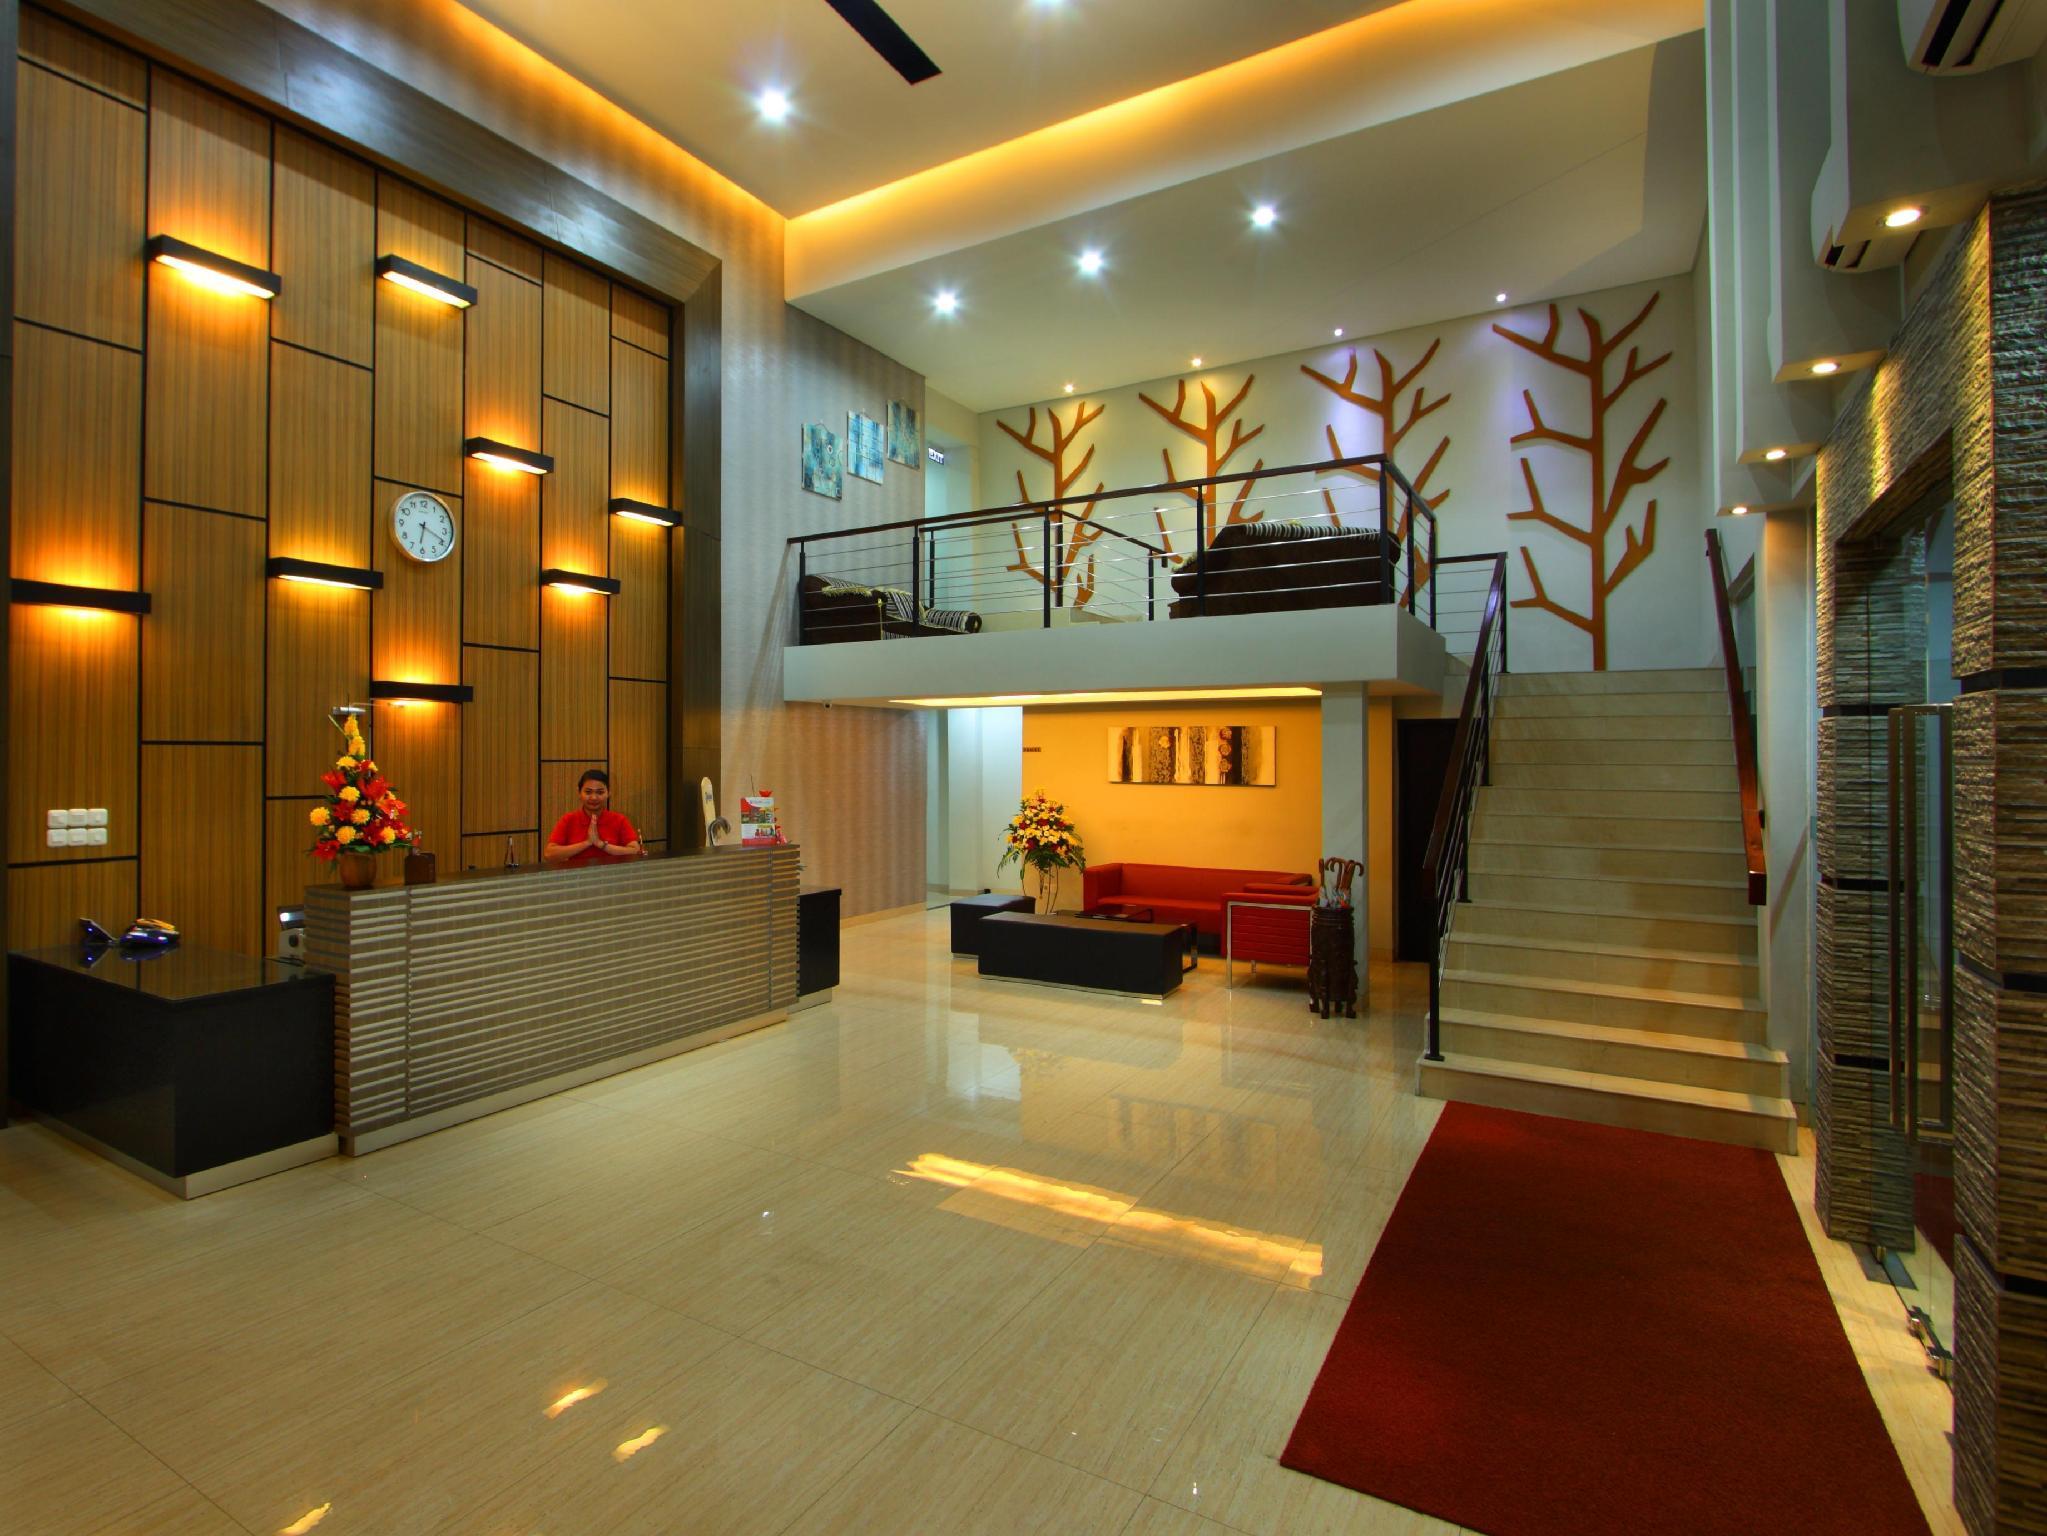 Hotel Dafam Semarang Promo Harga Terbaik Vtwctr Voucher Louis Kienne Simpang 5 Sumi Lima